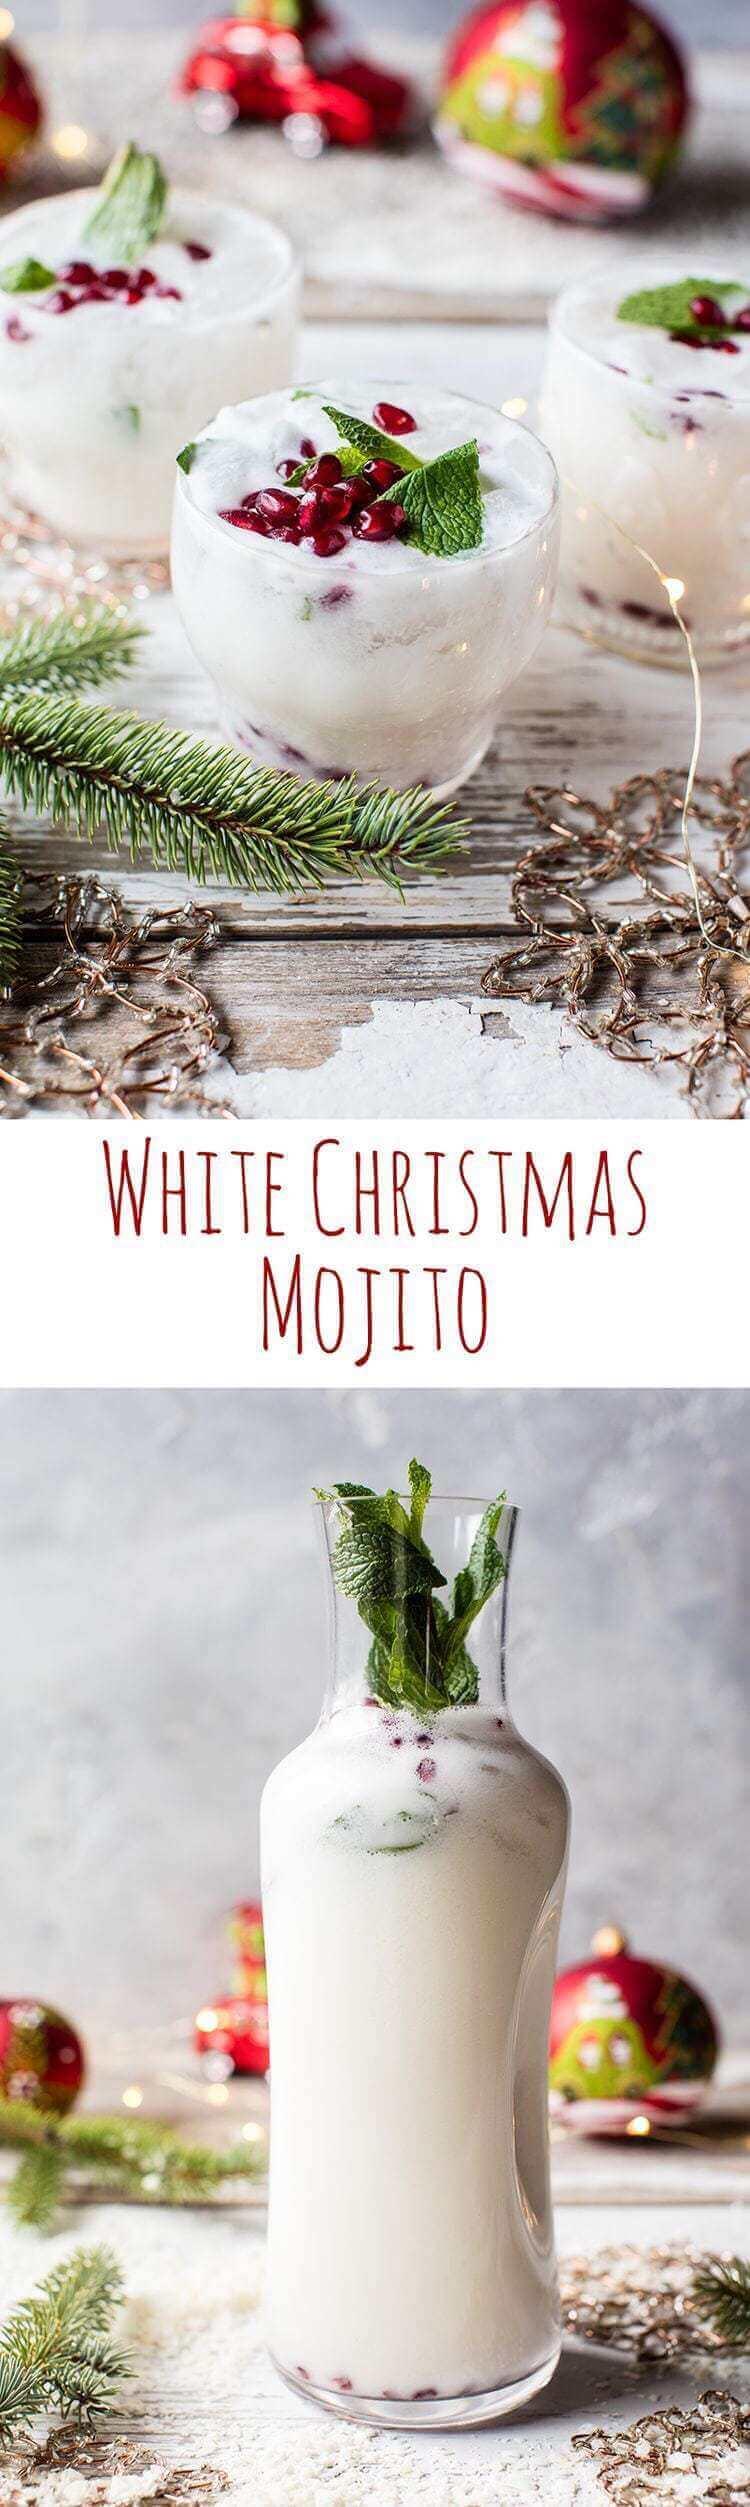 White Christmas Mojito(1)